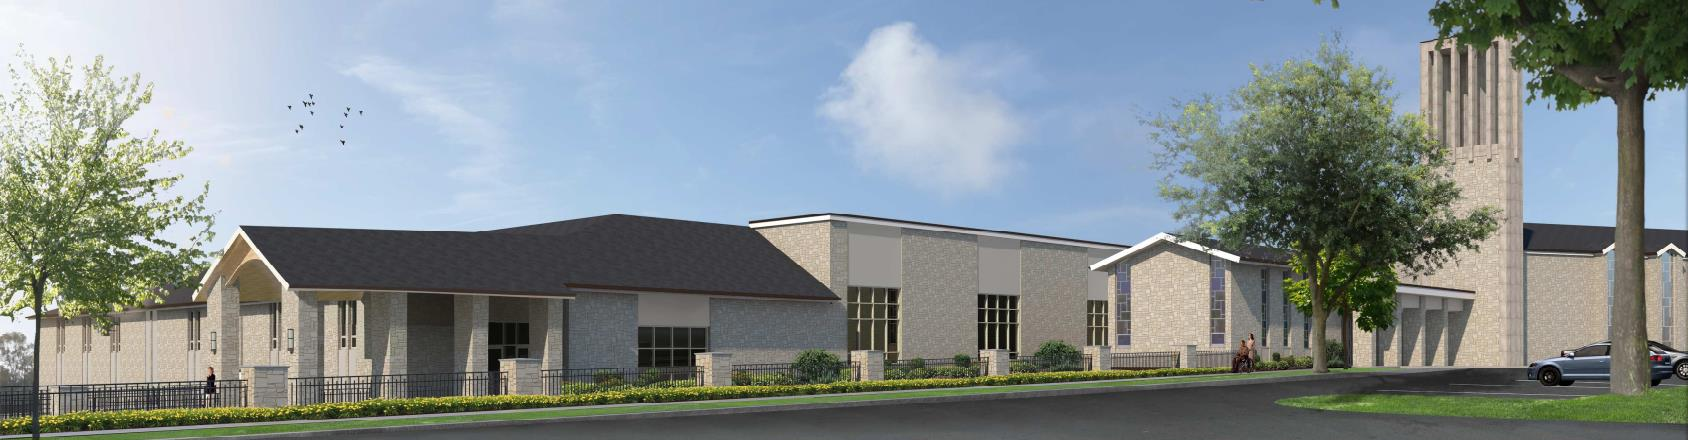 3D Rendering of New Building Exterior